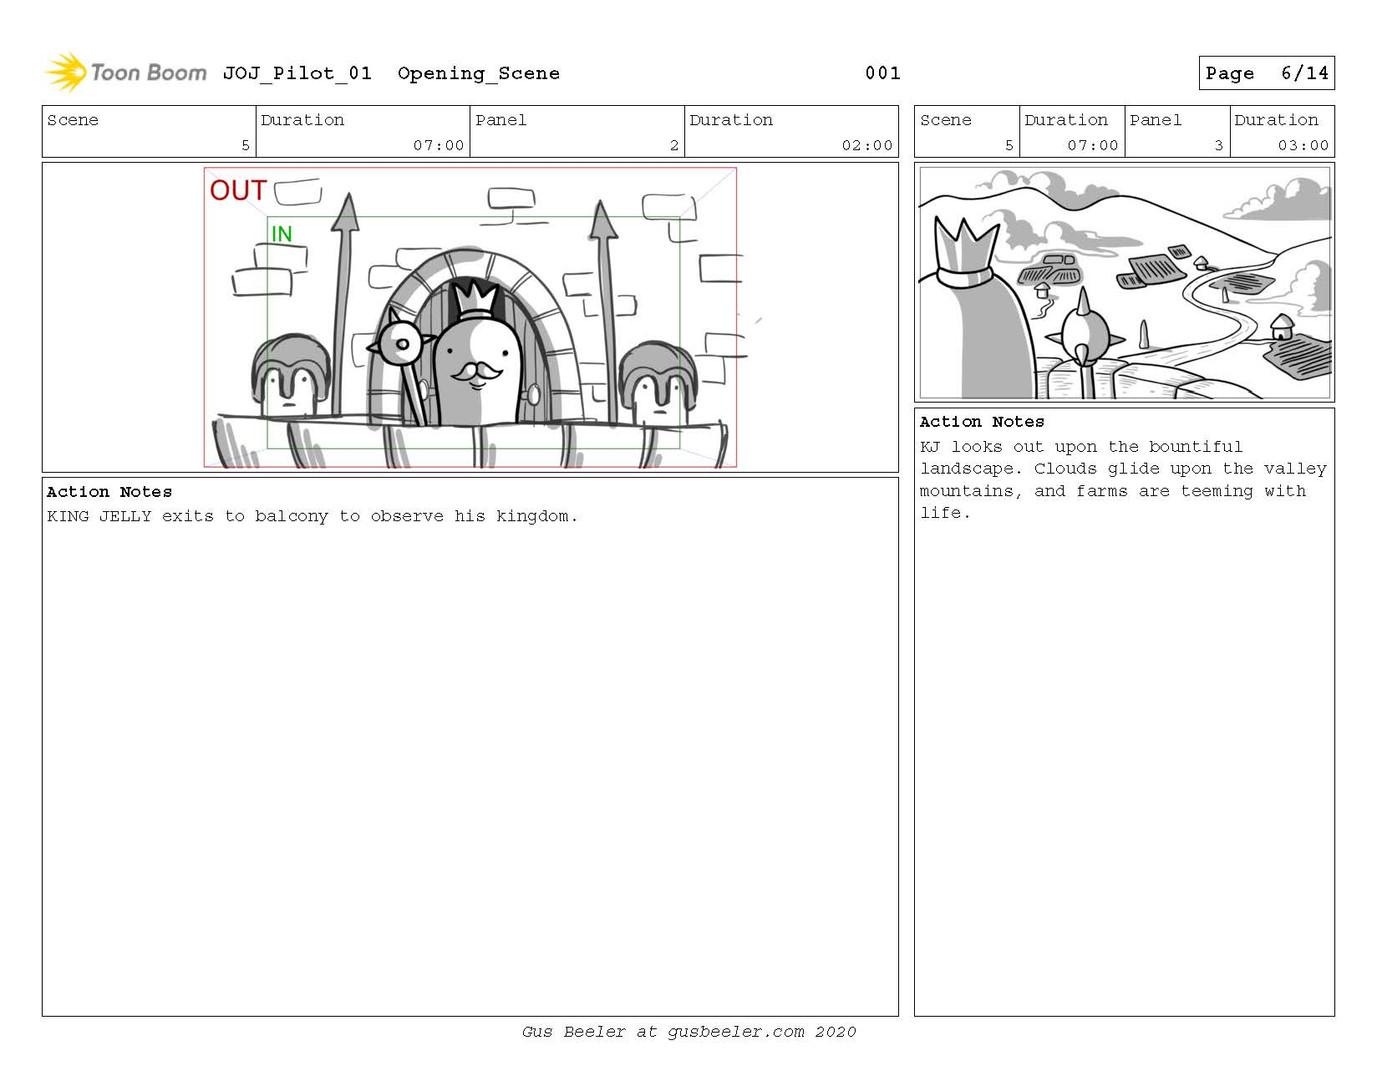 Abeeler_JOJ_Pilot_002_Page_07.jpg